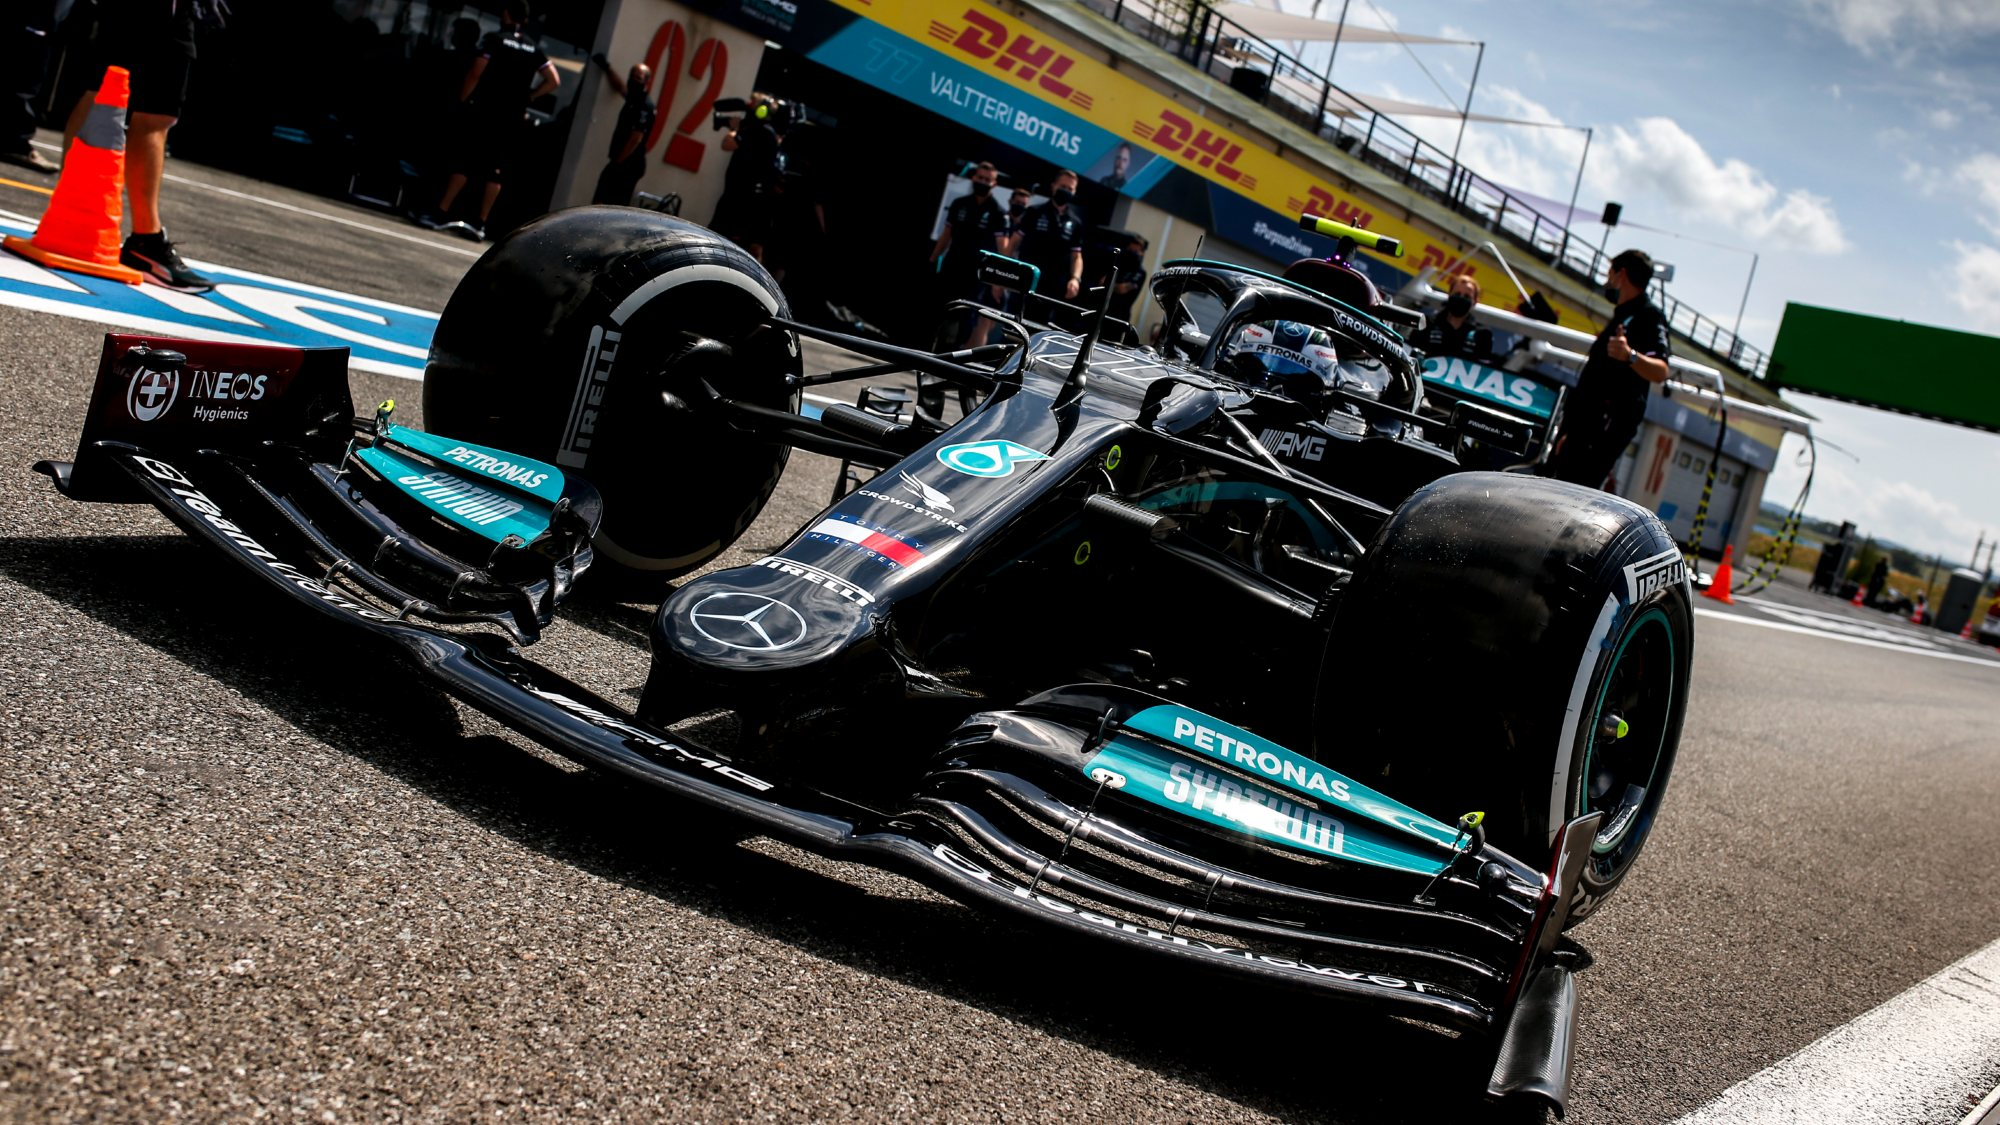 Valtteri Bottas, 2021 Merc French GP